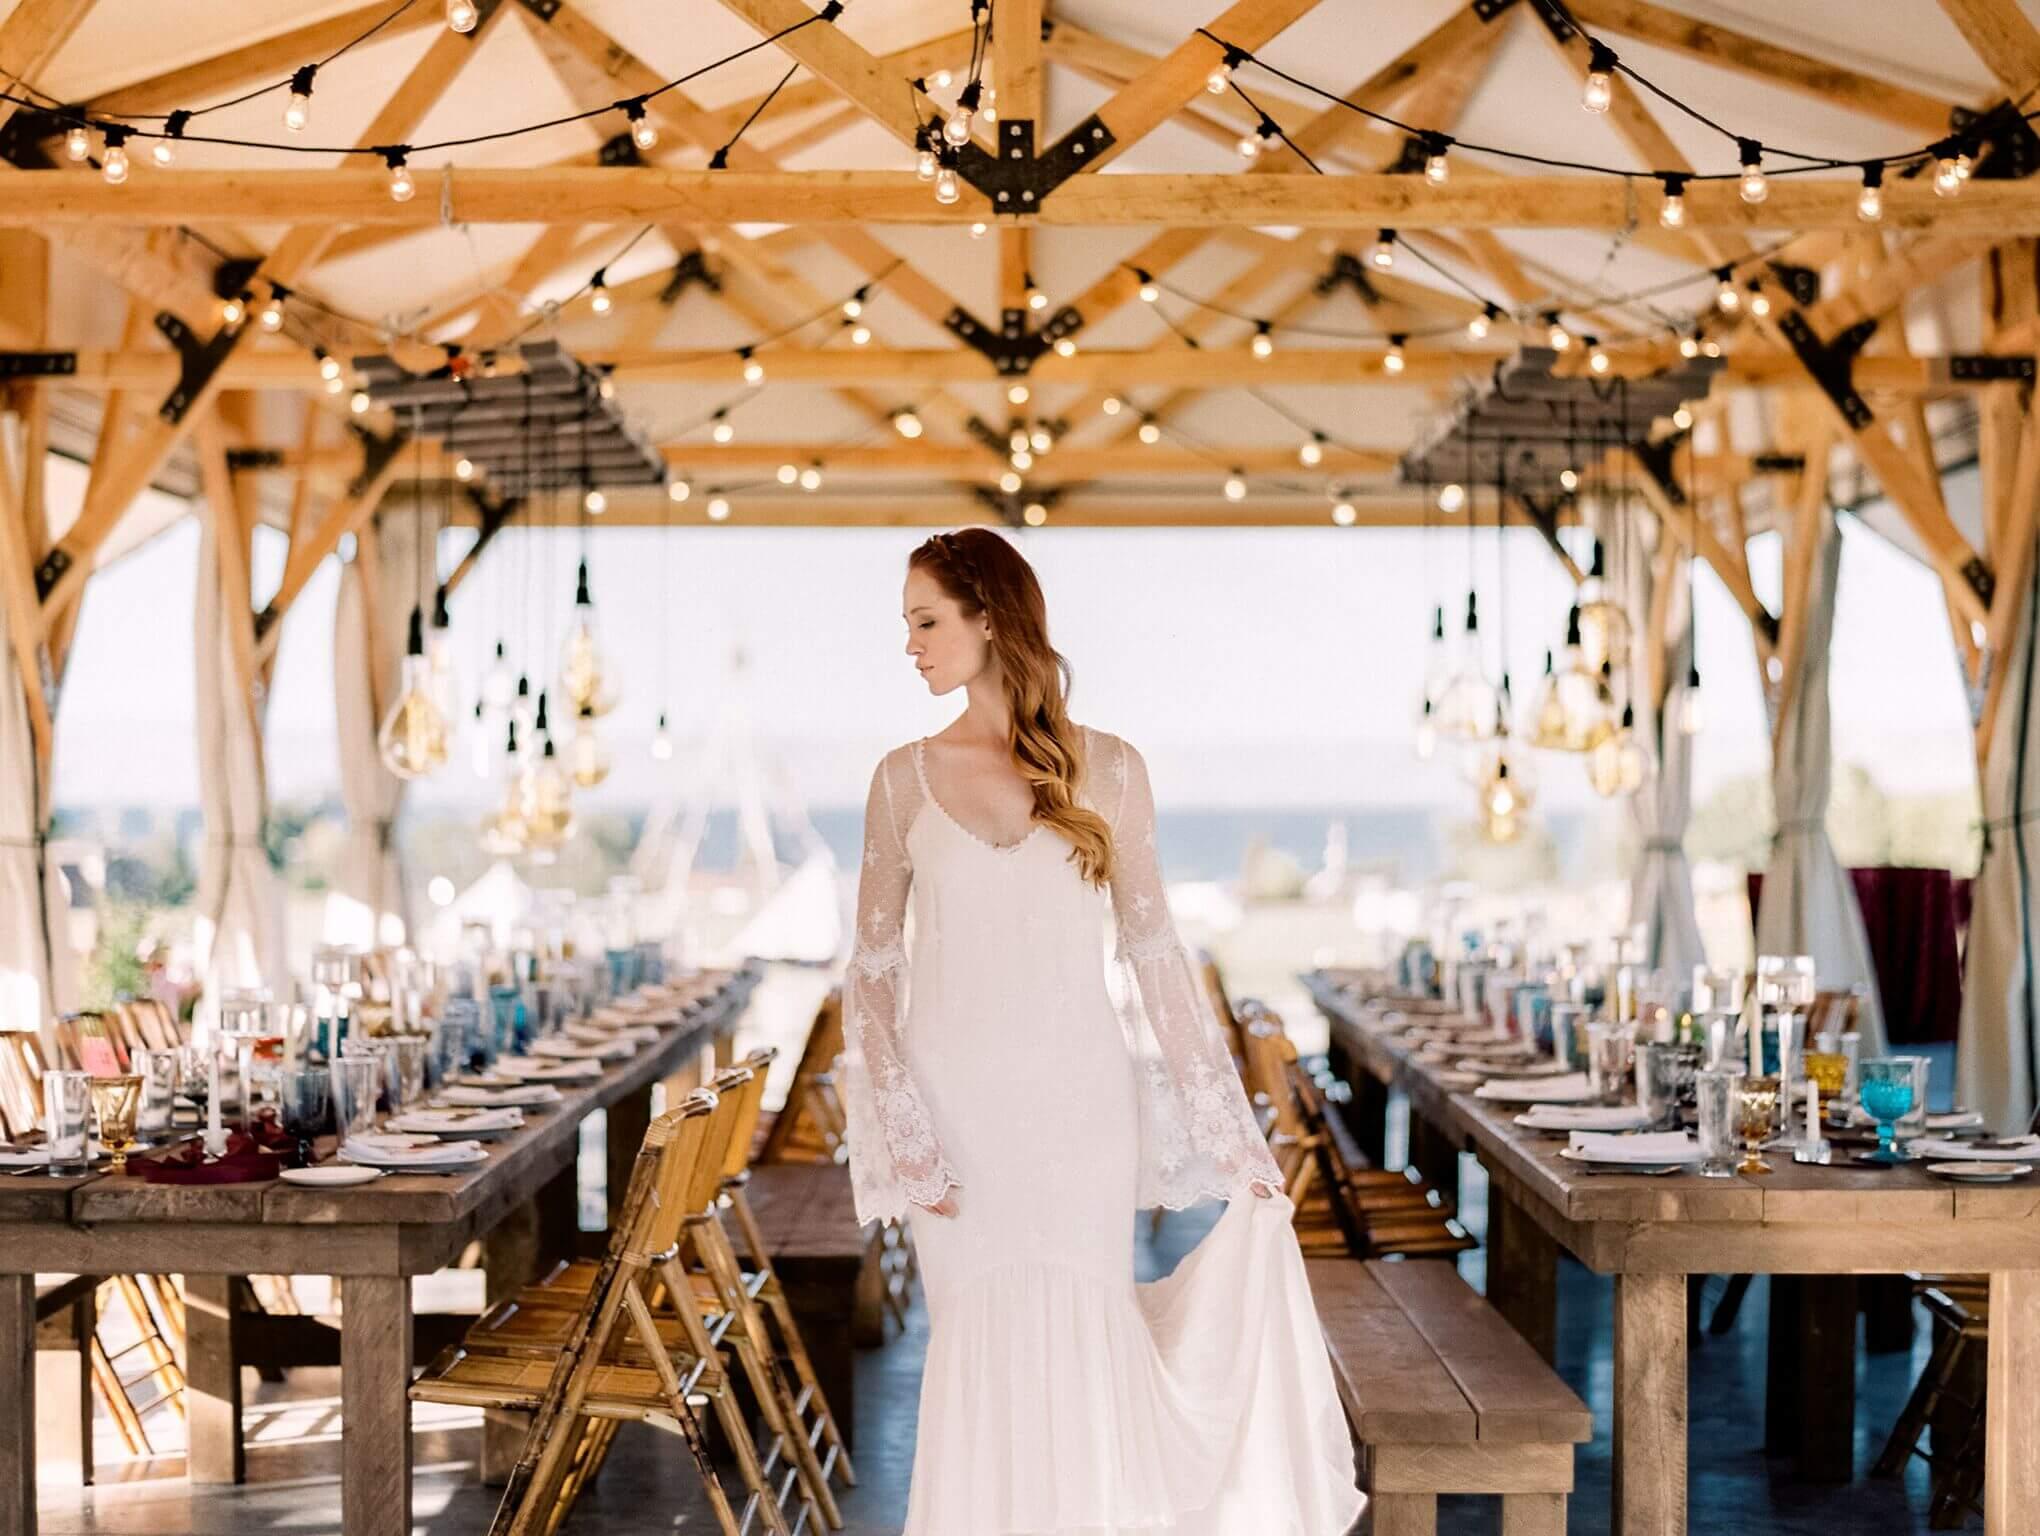 Summer Wedding - Summer facilities